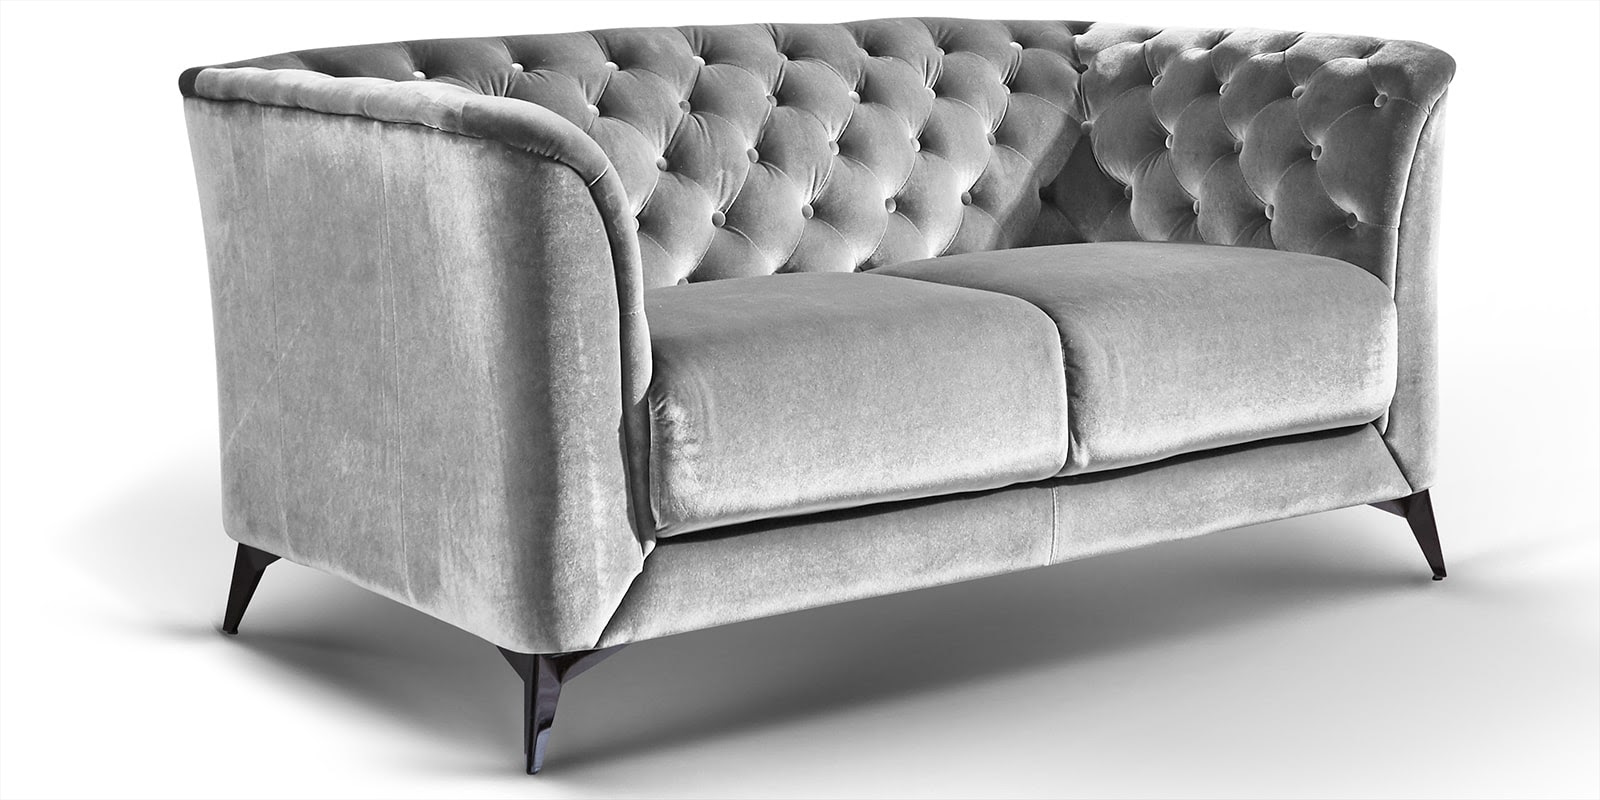 Chesterfield Sofa Grau Samt 2er Set Leder Couch Graue 2 ...